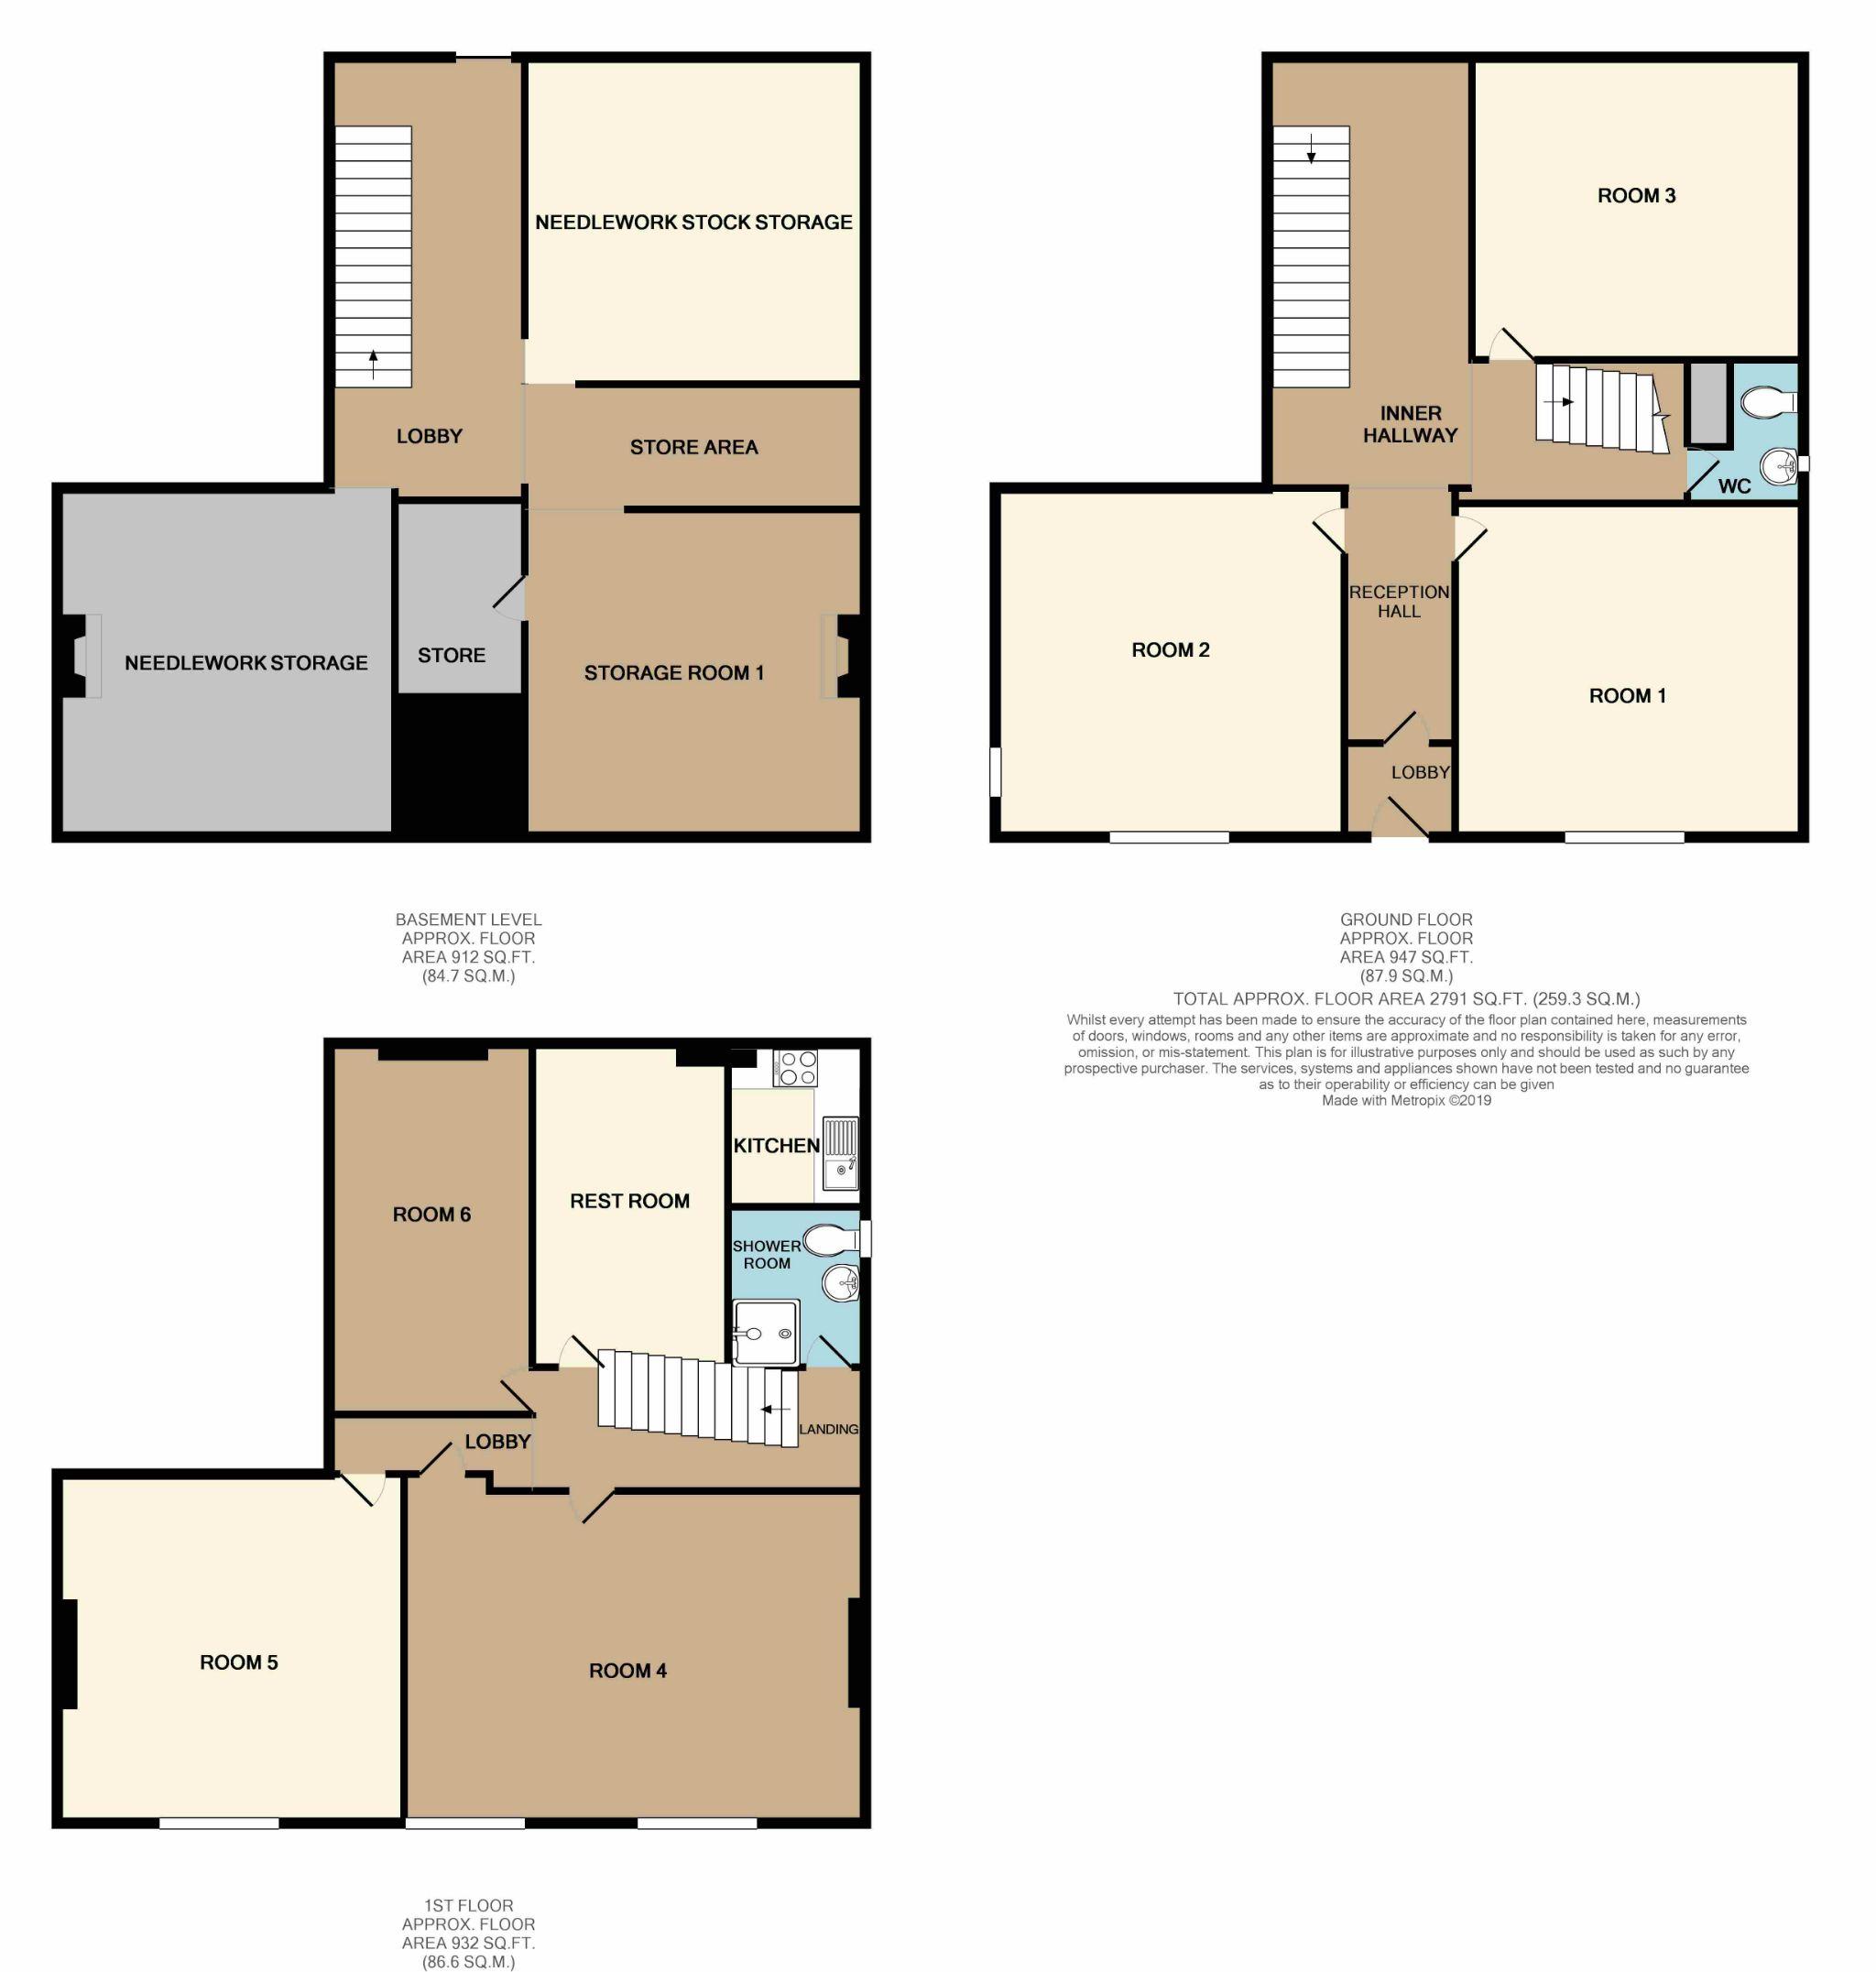 Office For Sale - Floorplan 1